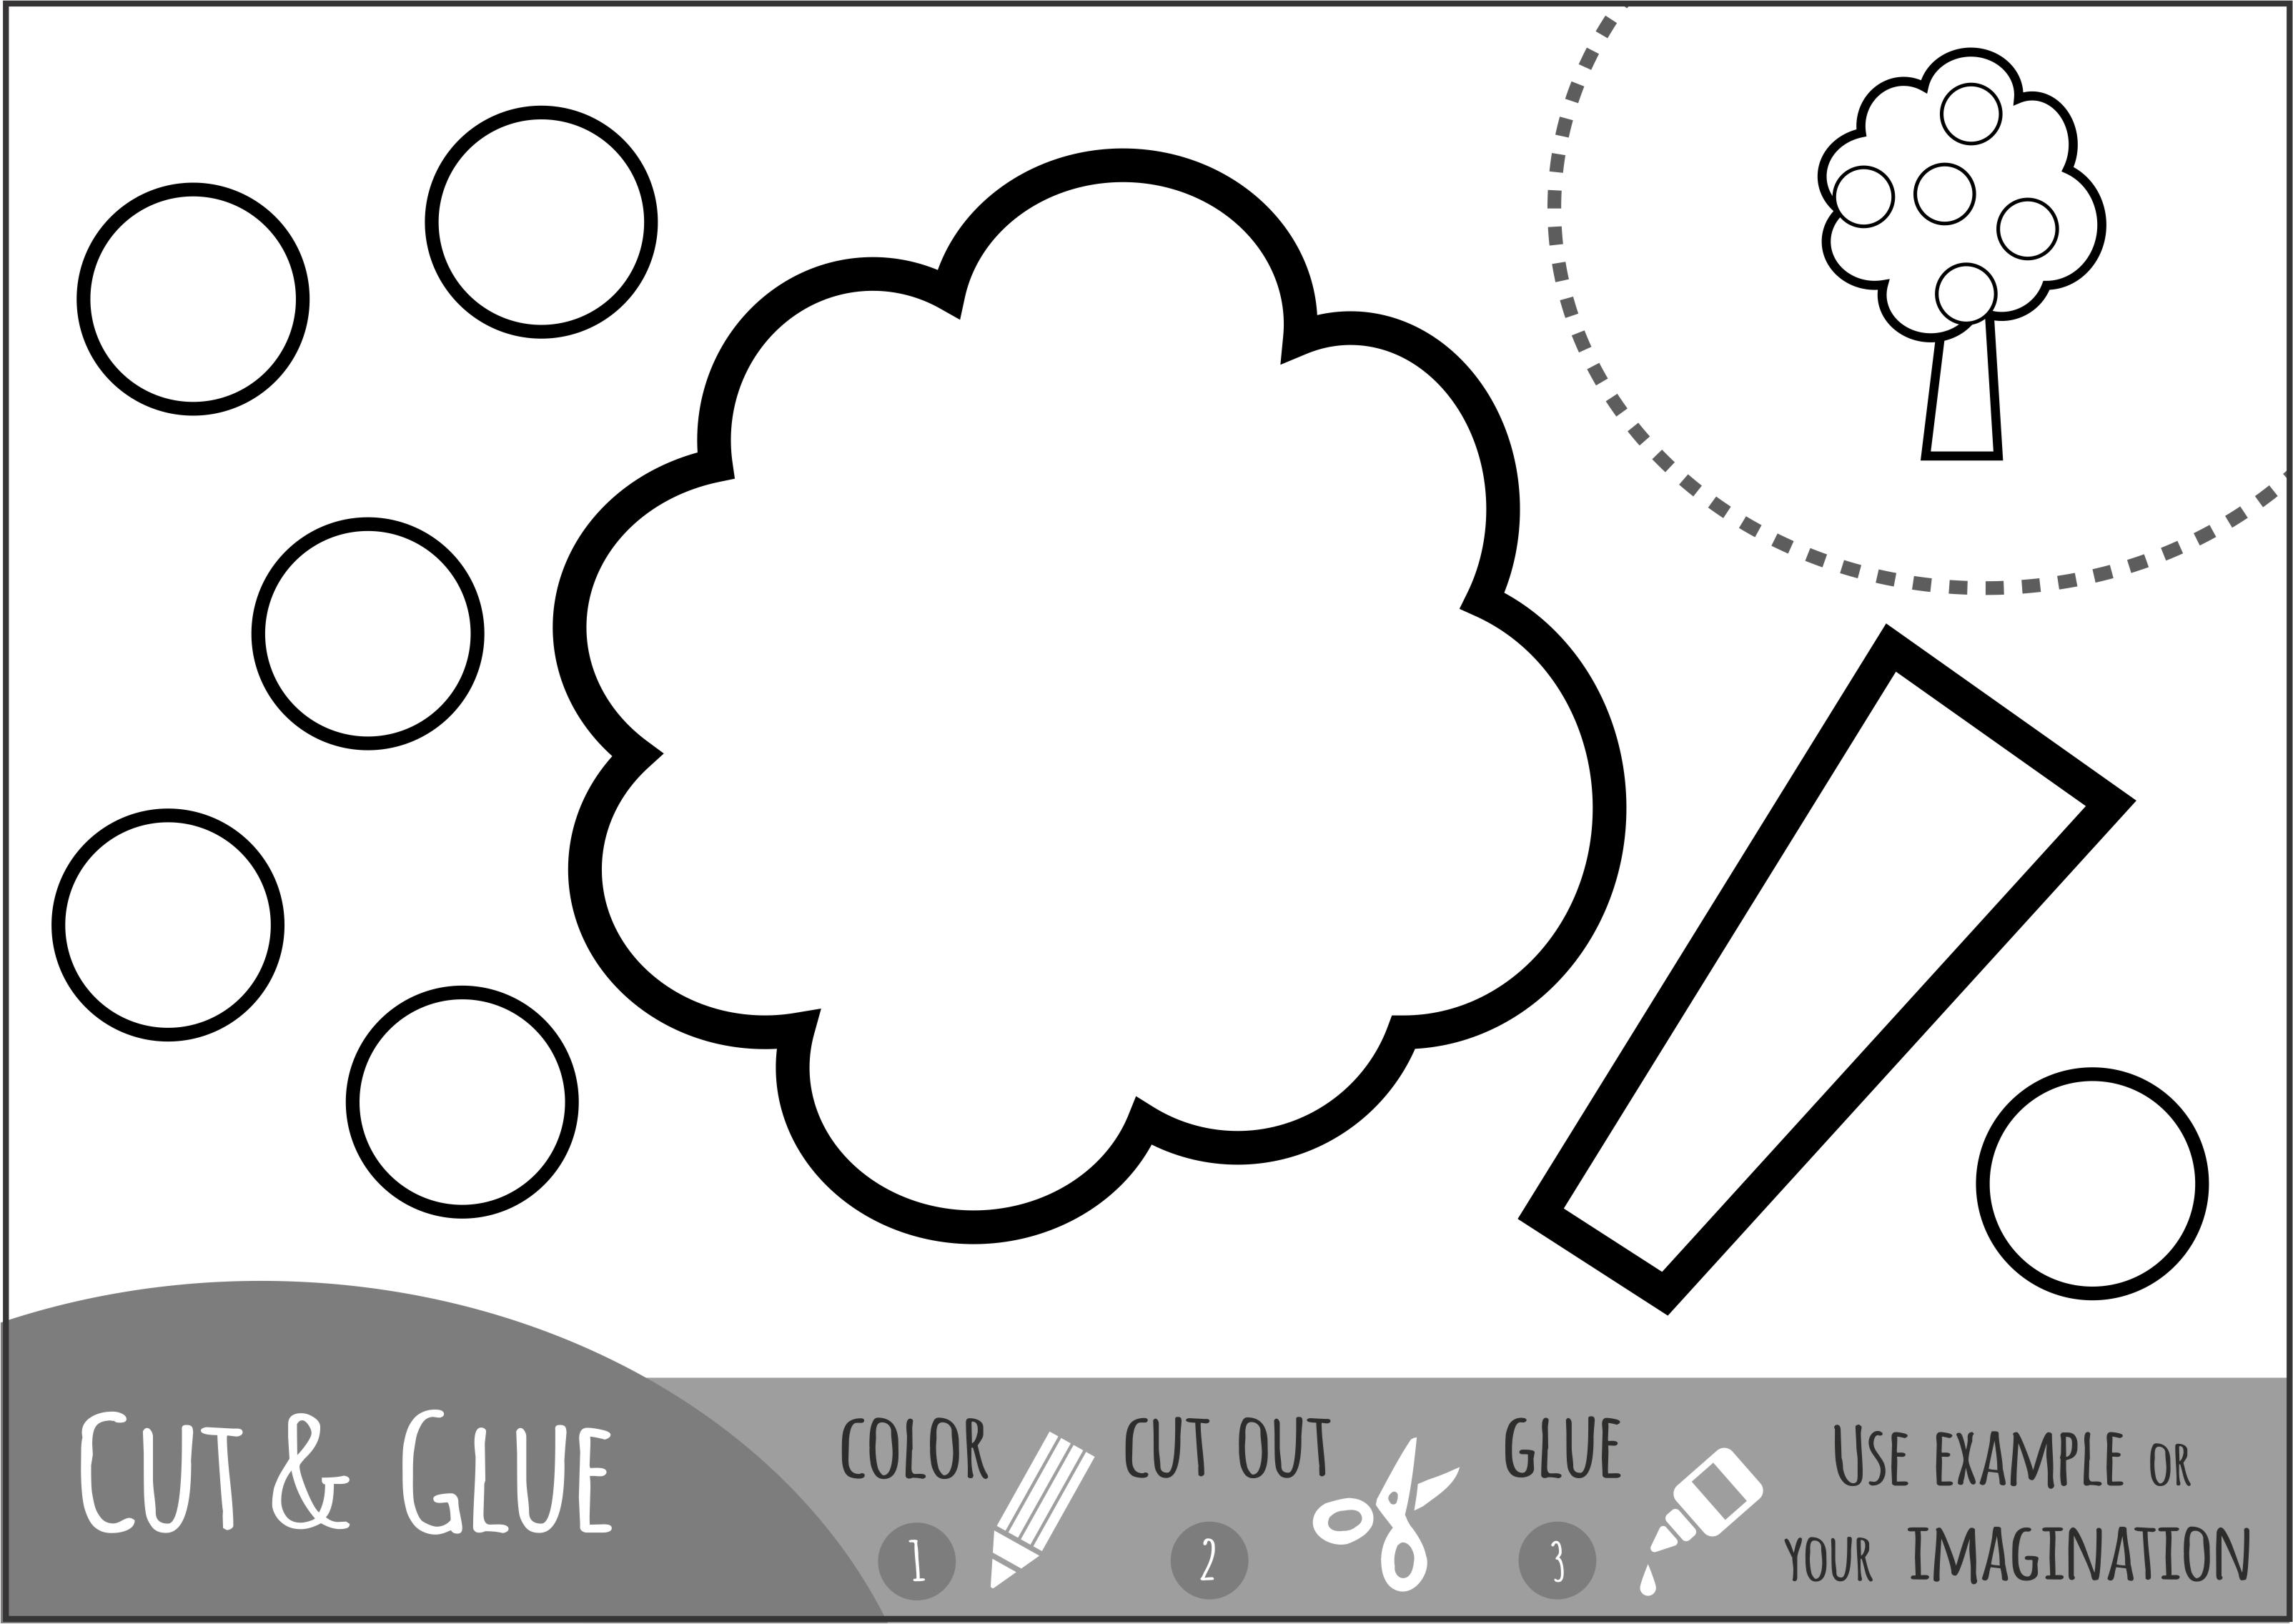 Color Cut And Glue Scissor Skill Practice For Fall 2